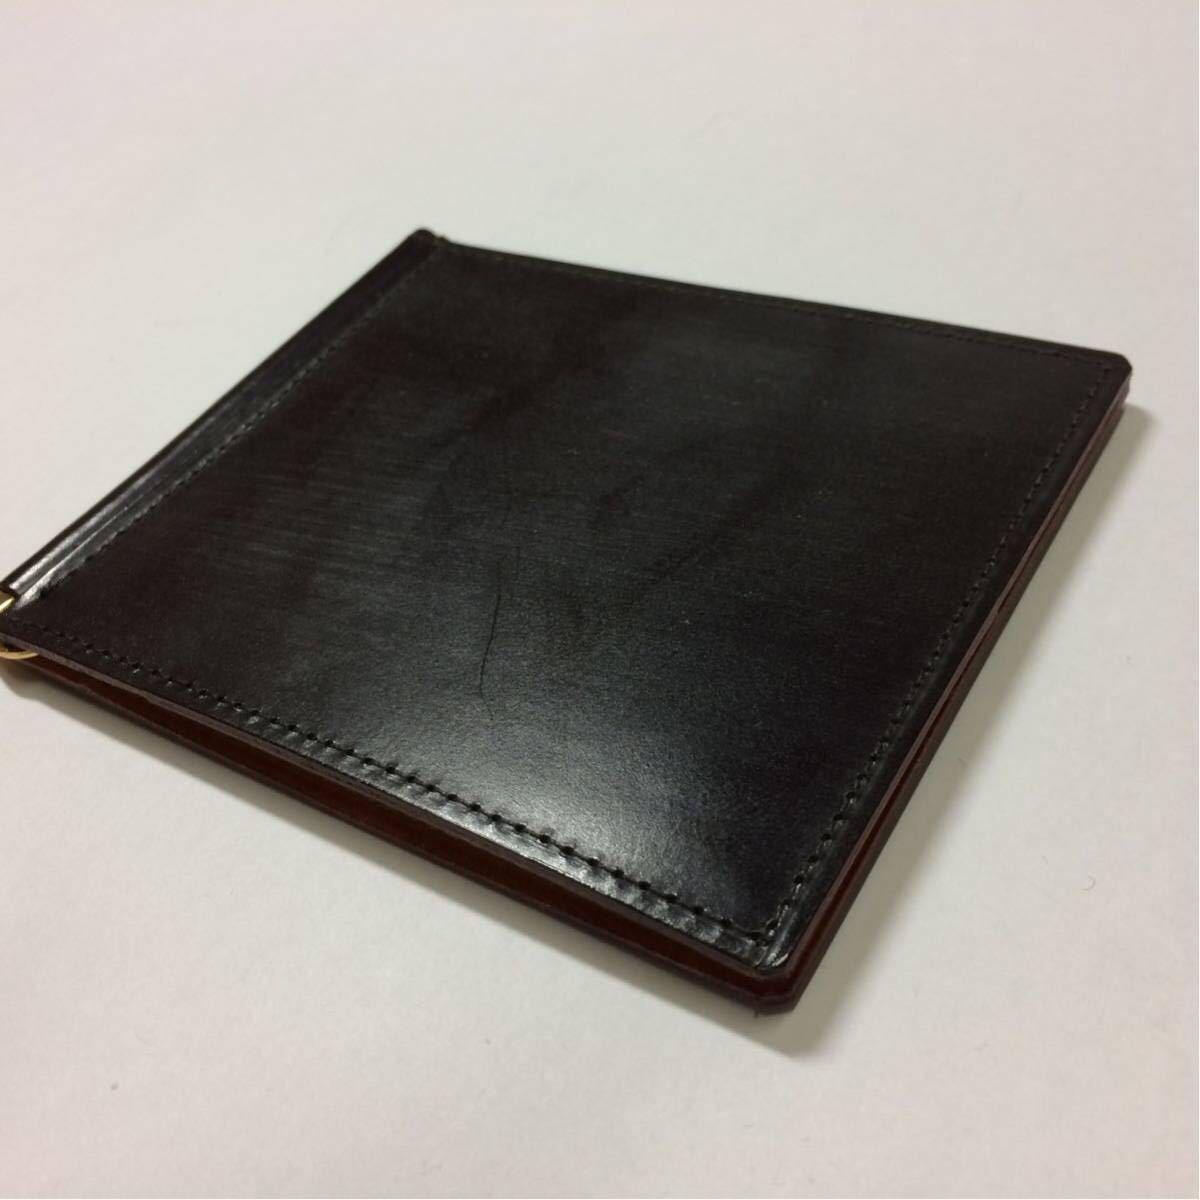 2f294590a0ac 美品 GANZO ガンゾ シンブライドル マネークリップ 財布 ブライドルレザーの1番目の画像